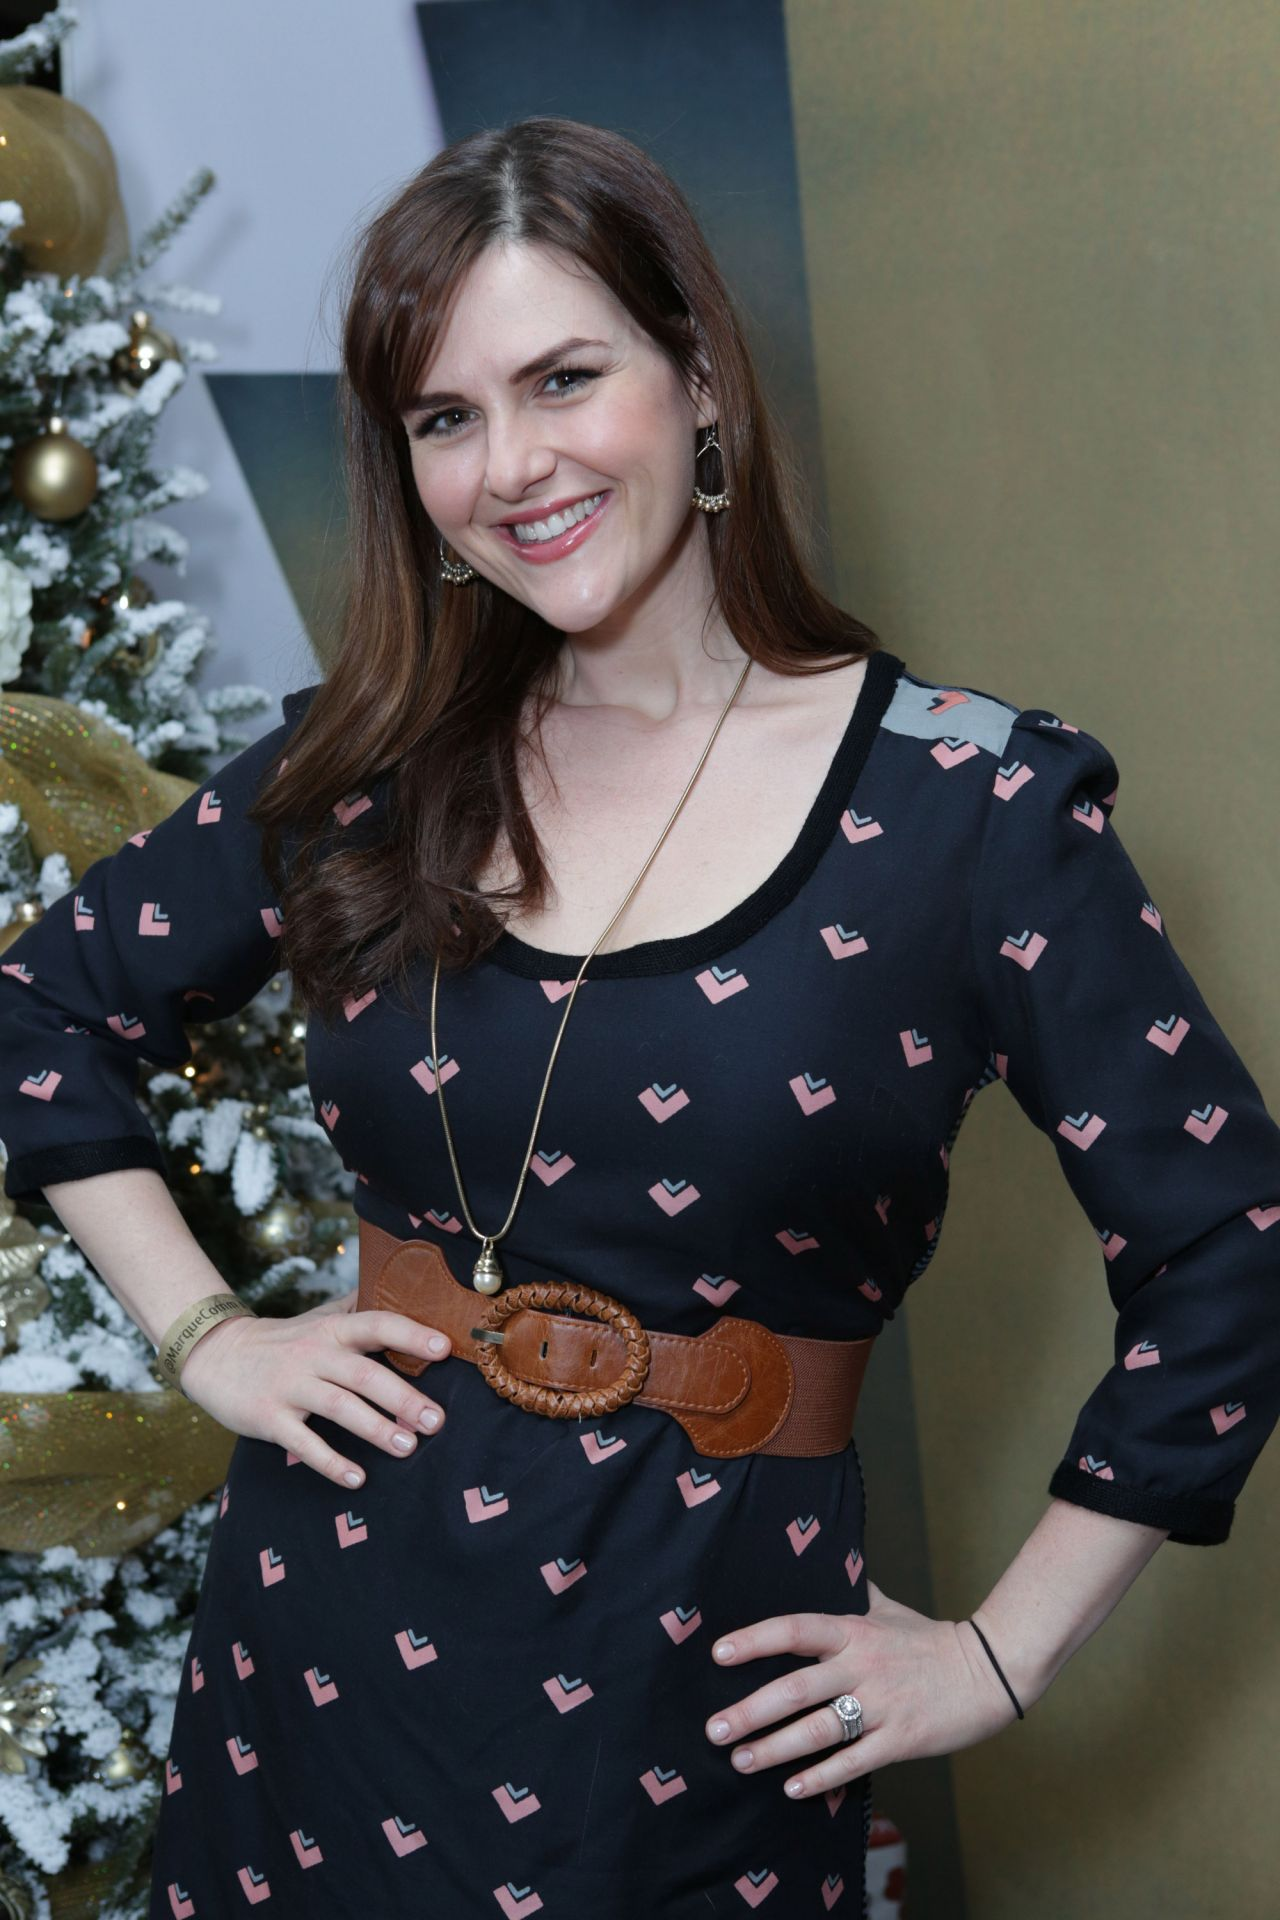 Sara Rue Attends 3rd Annual Santa